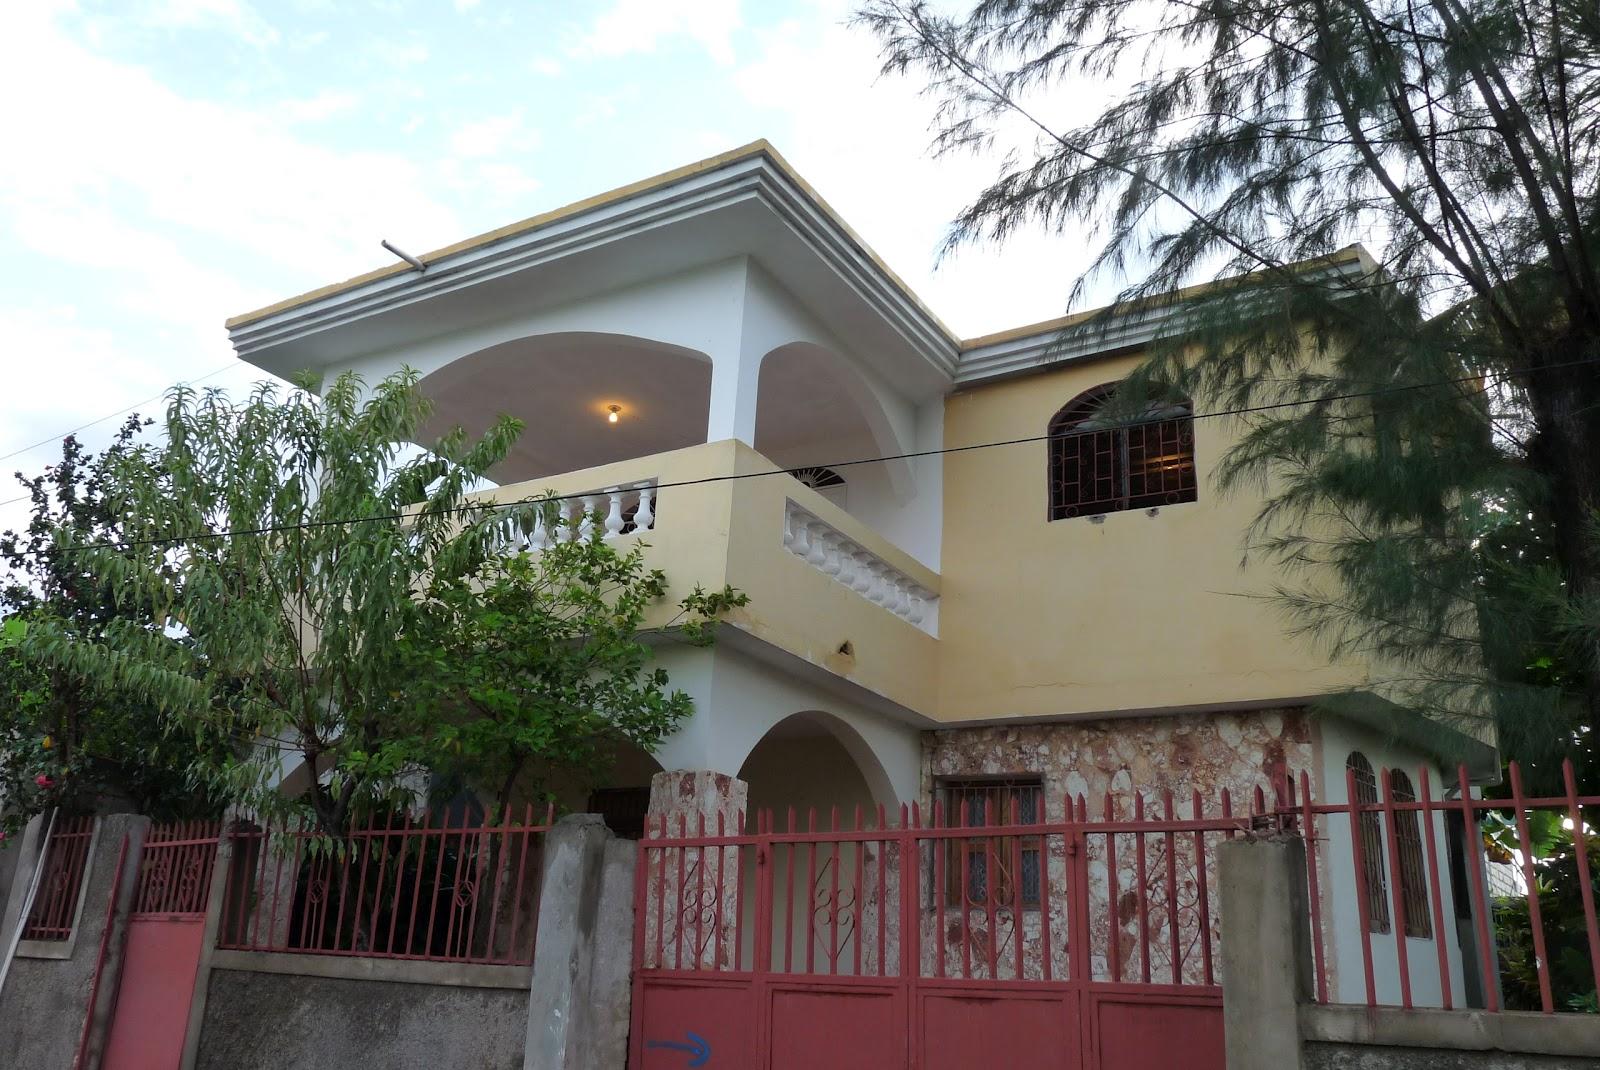 Mangoustansoleil haiti mars 2012 stage plan b for Maison moderne haiti